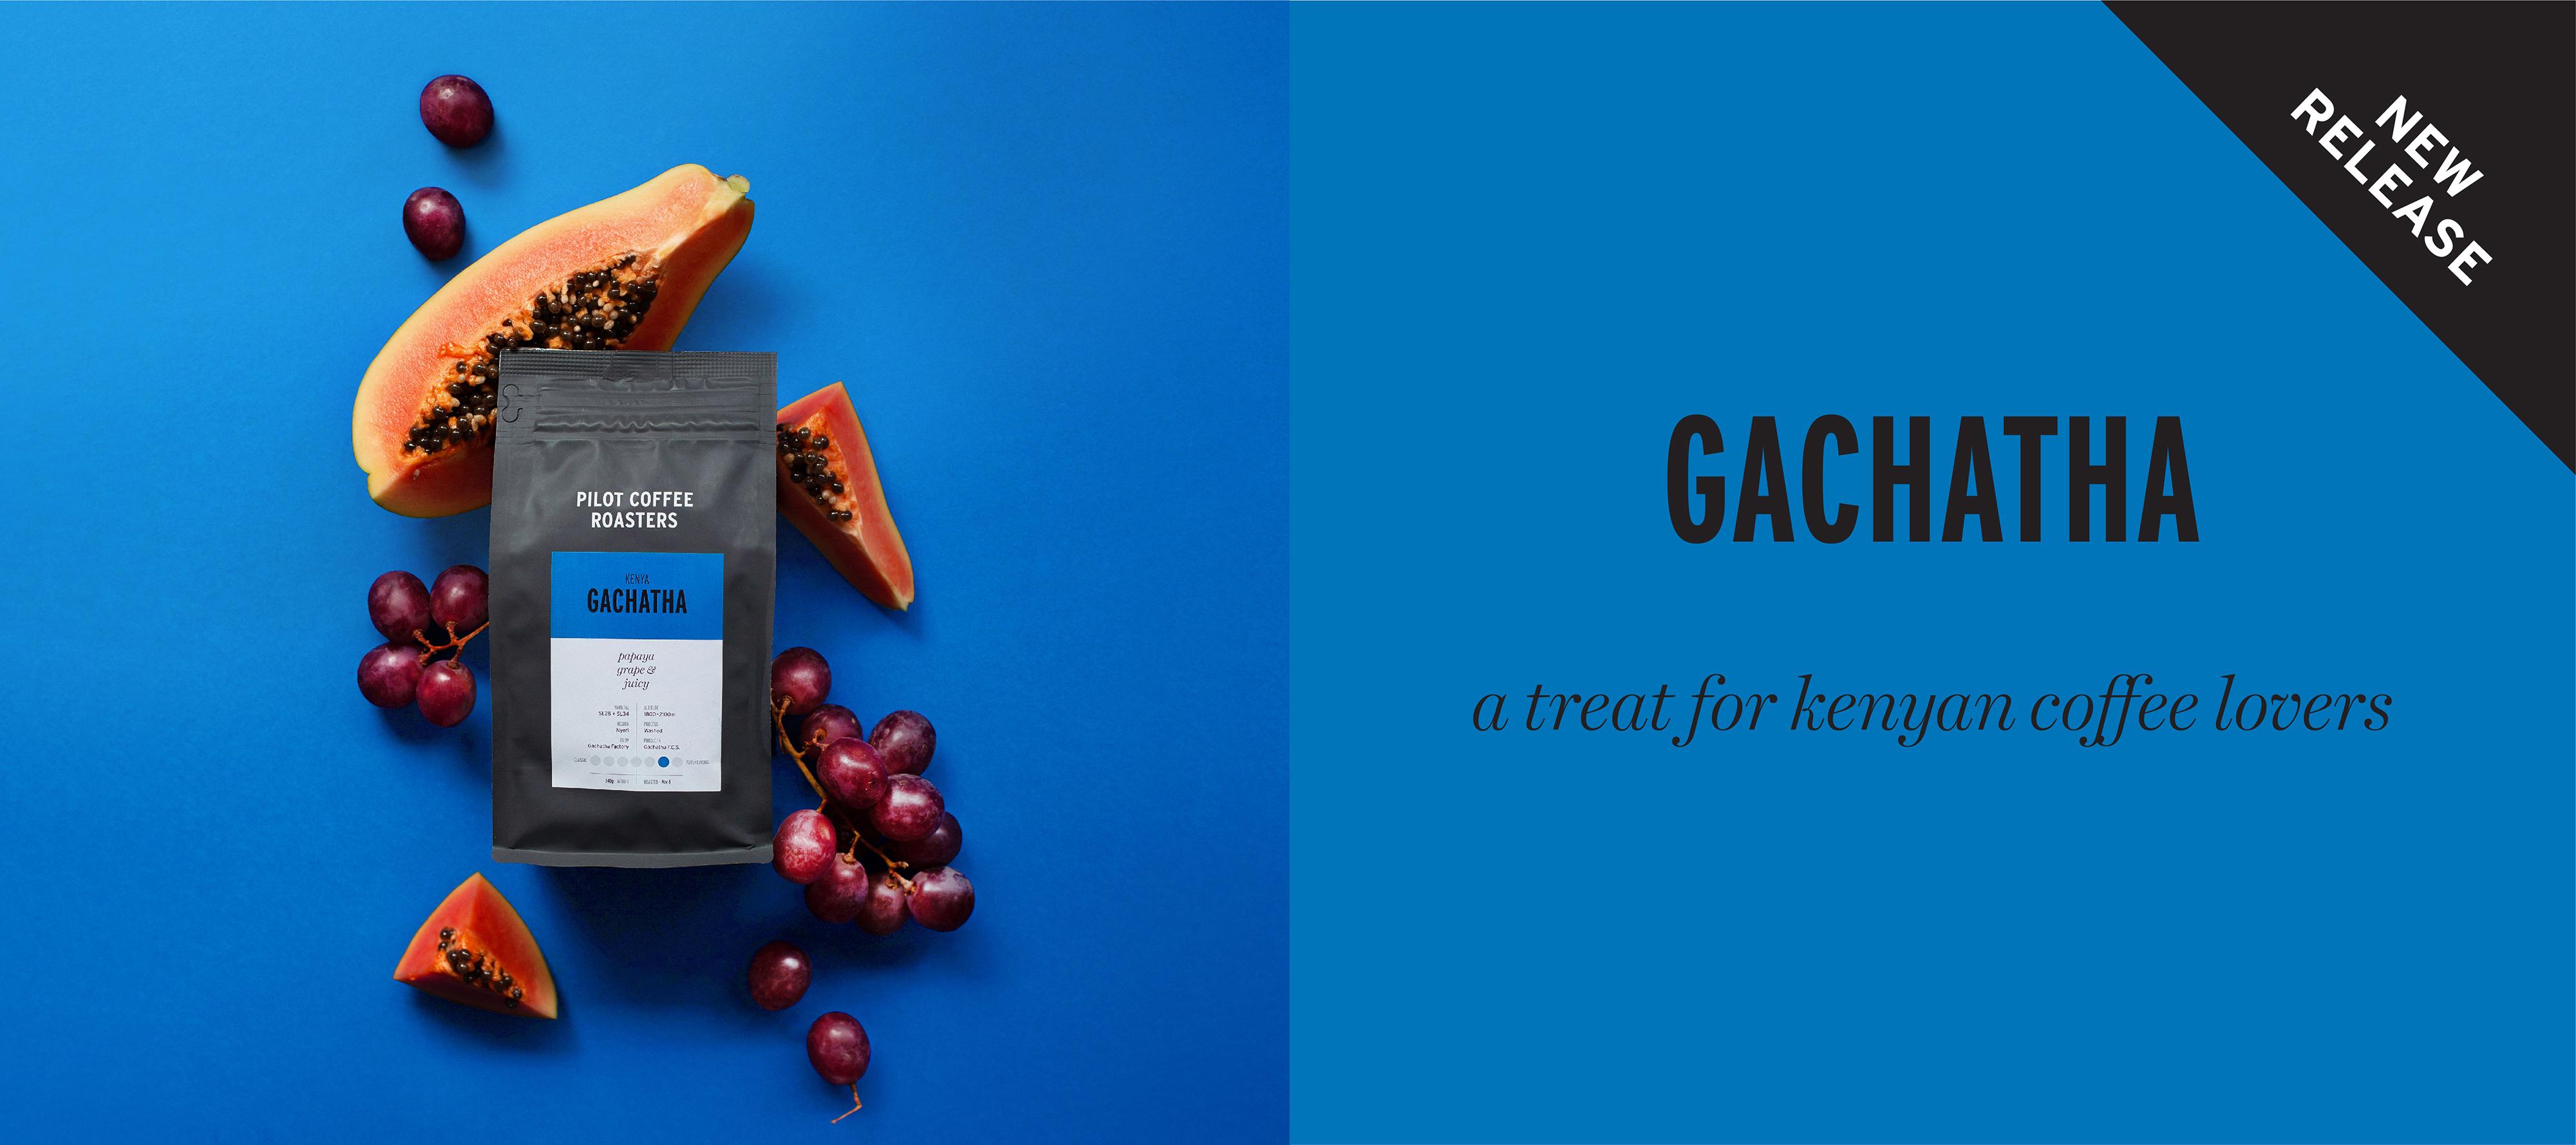 A treat for Kenyan coffee Lovers, Gachatha